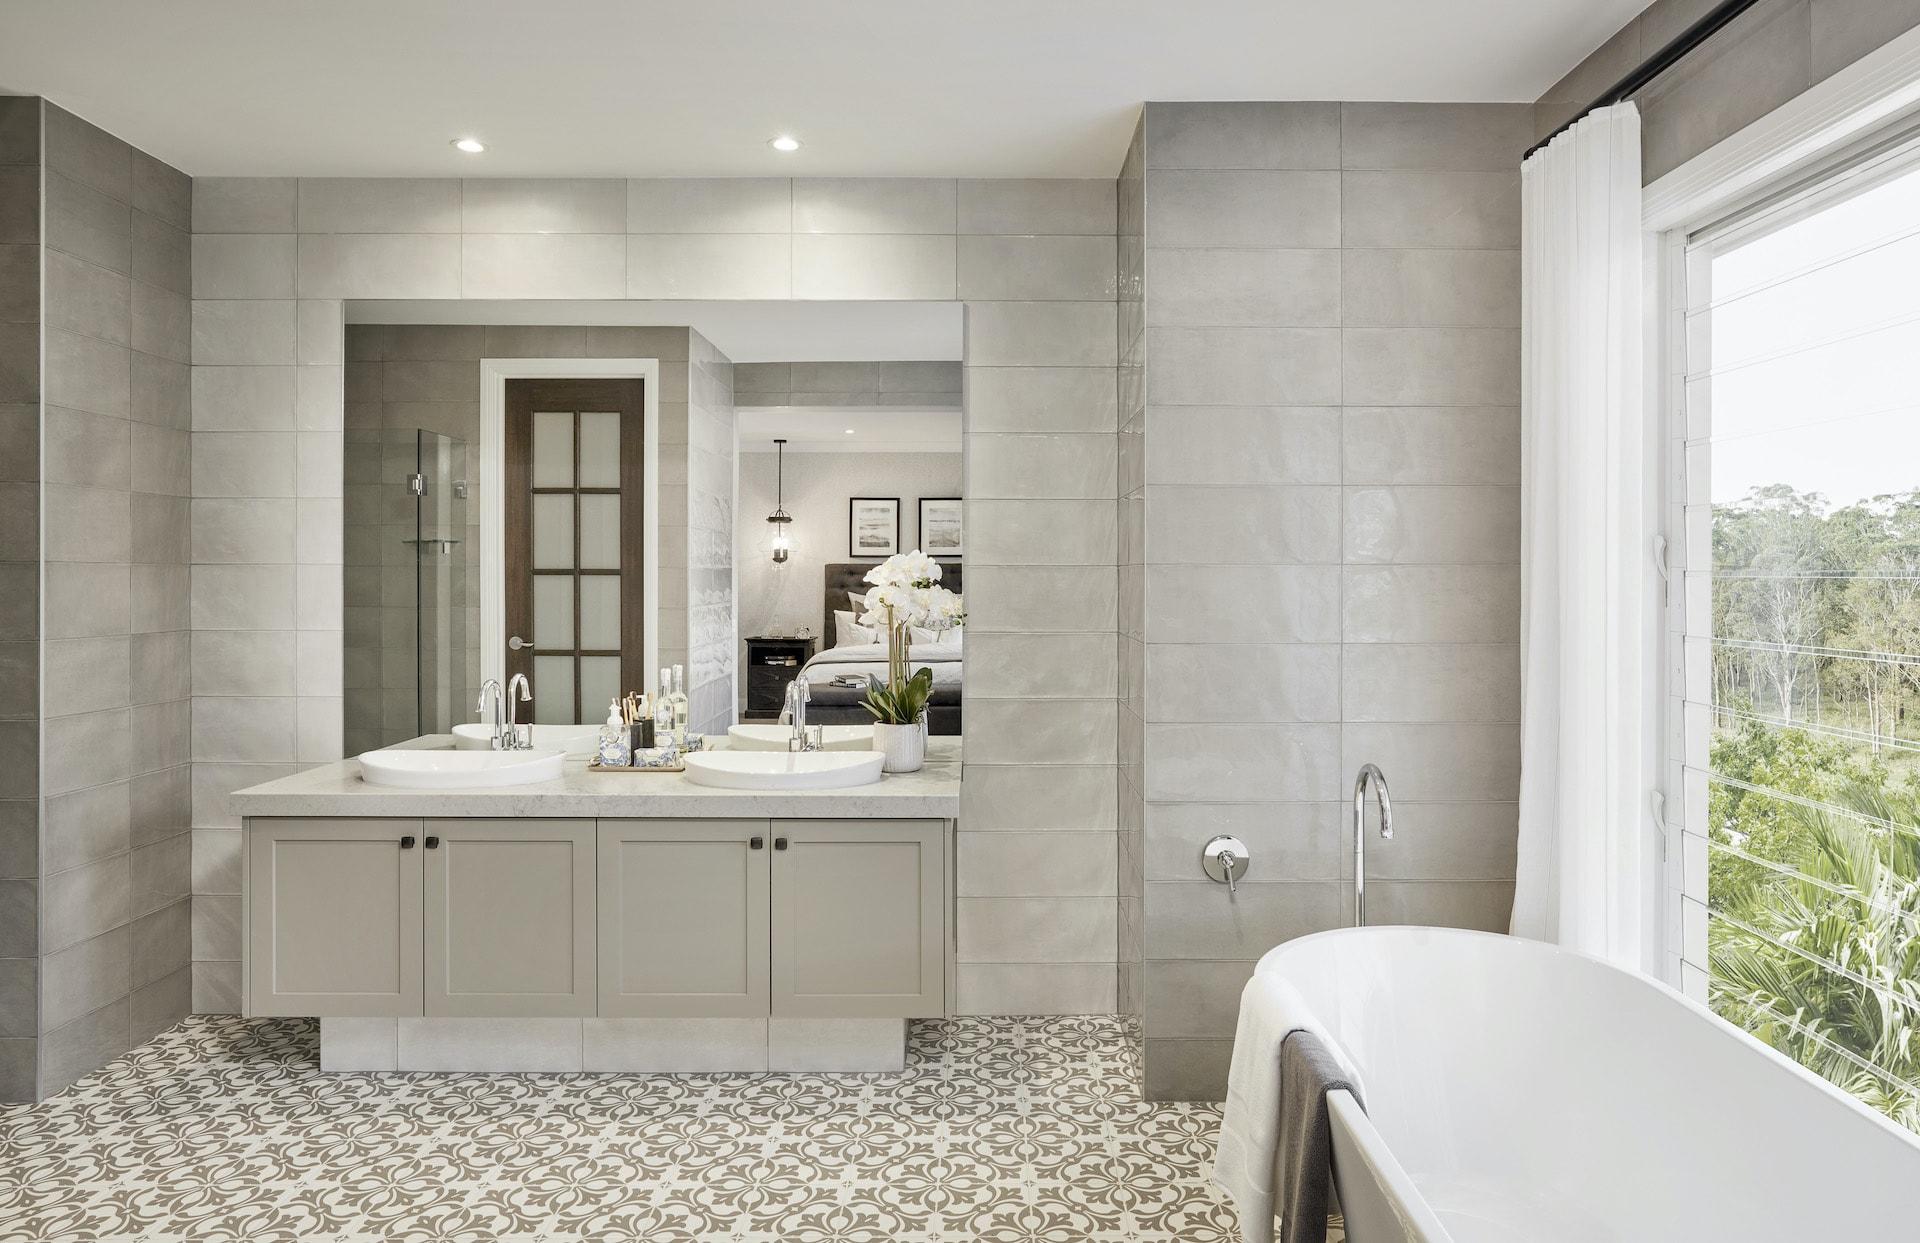 provincial bathroom design with grey shaker style bathroom vanity and round basins